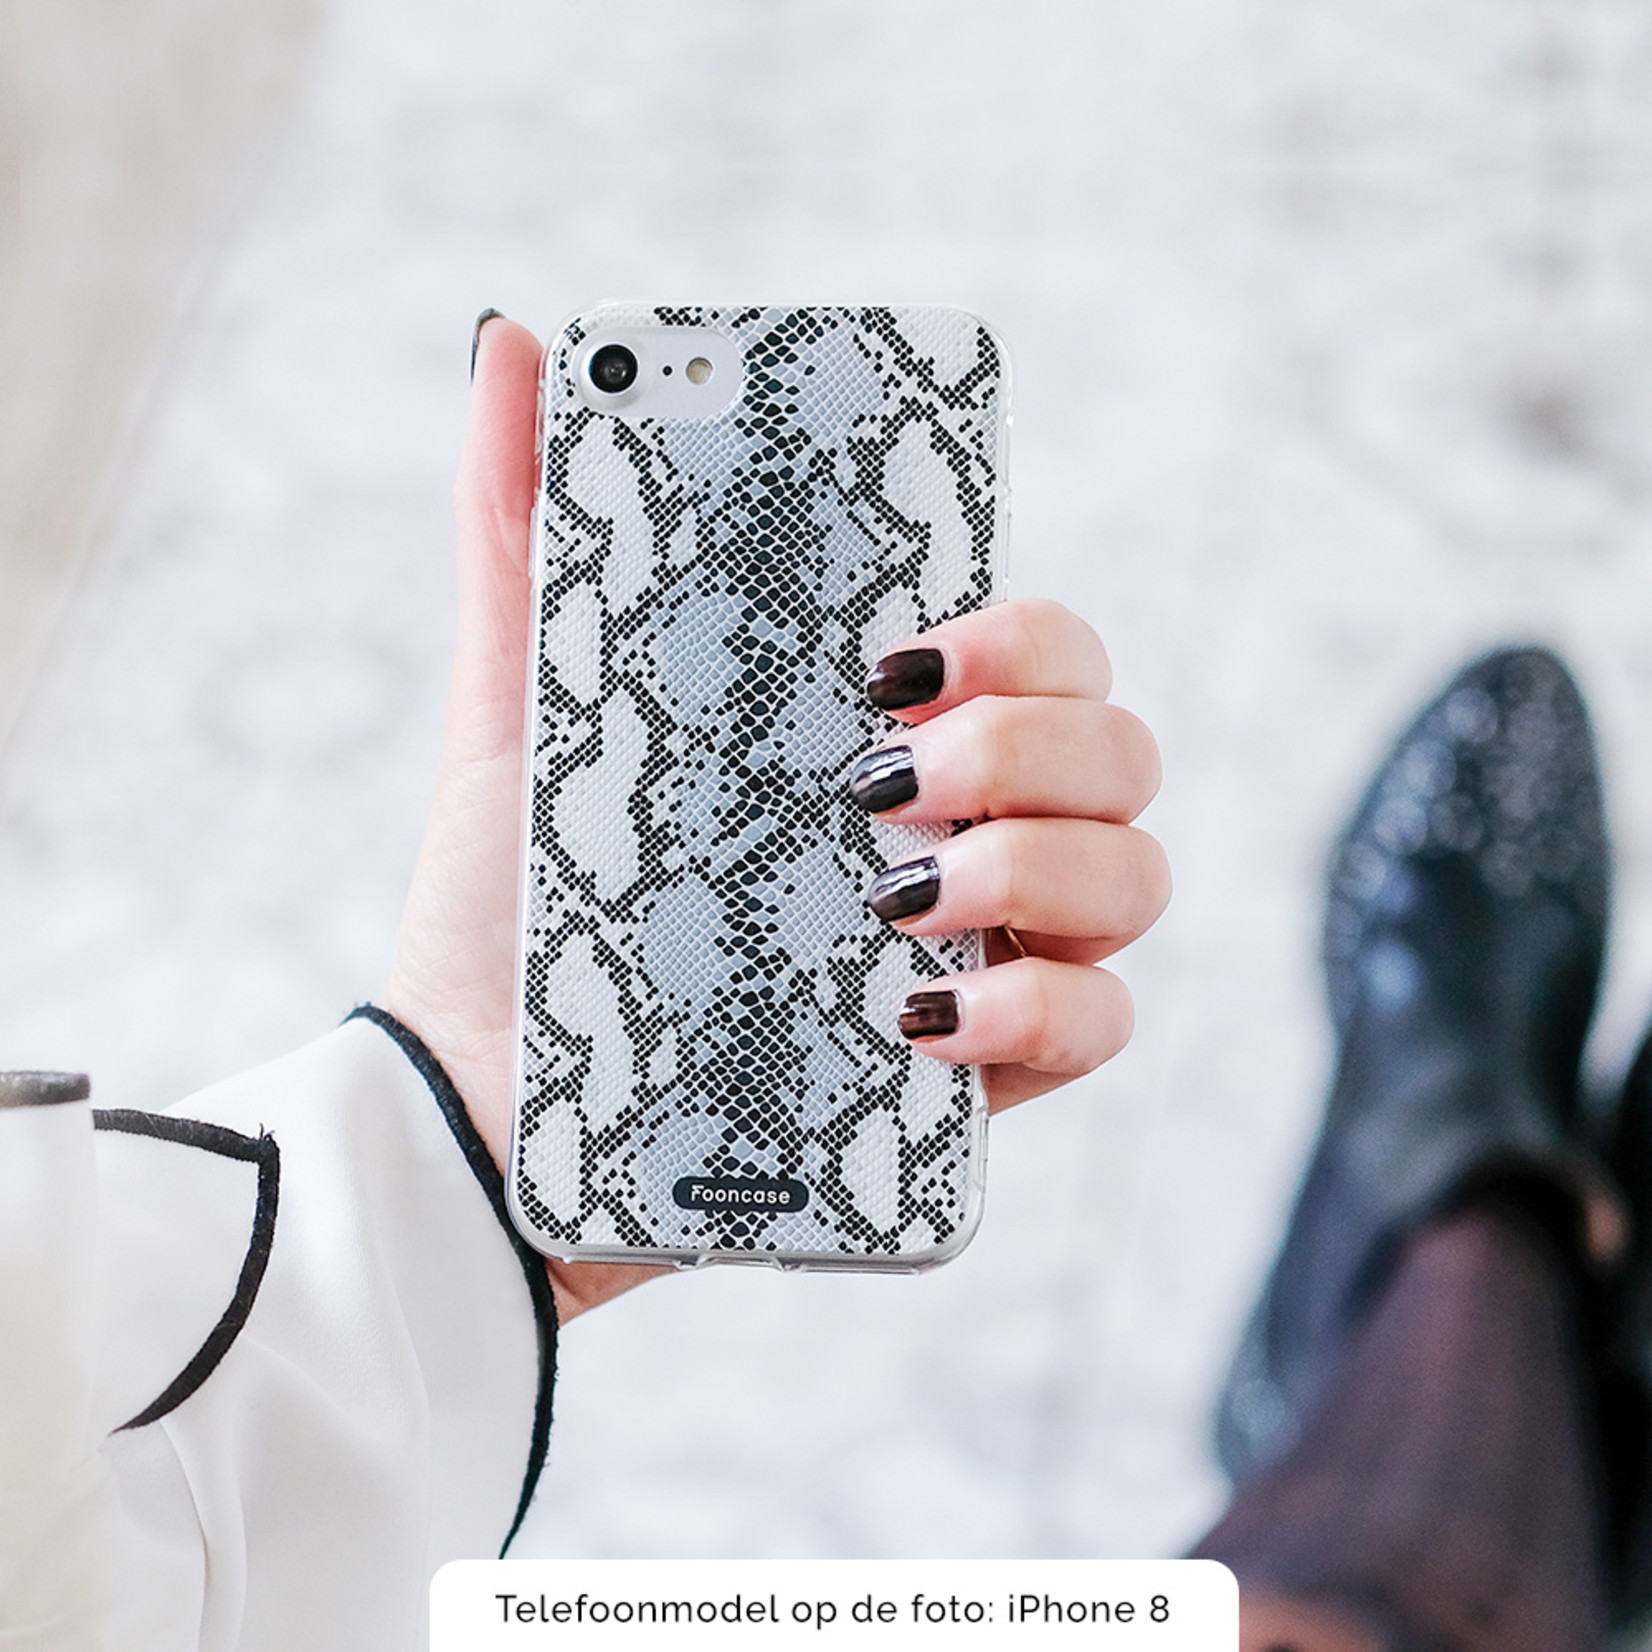 FOONCASE IPhone 12 Pro Max Case - Snake it!